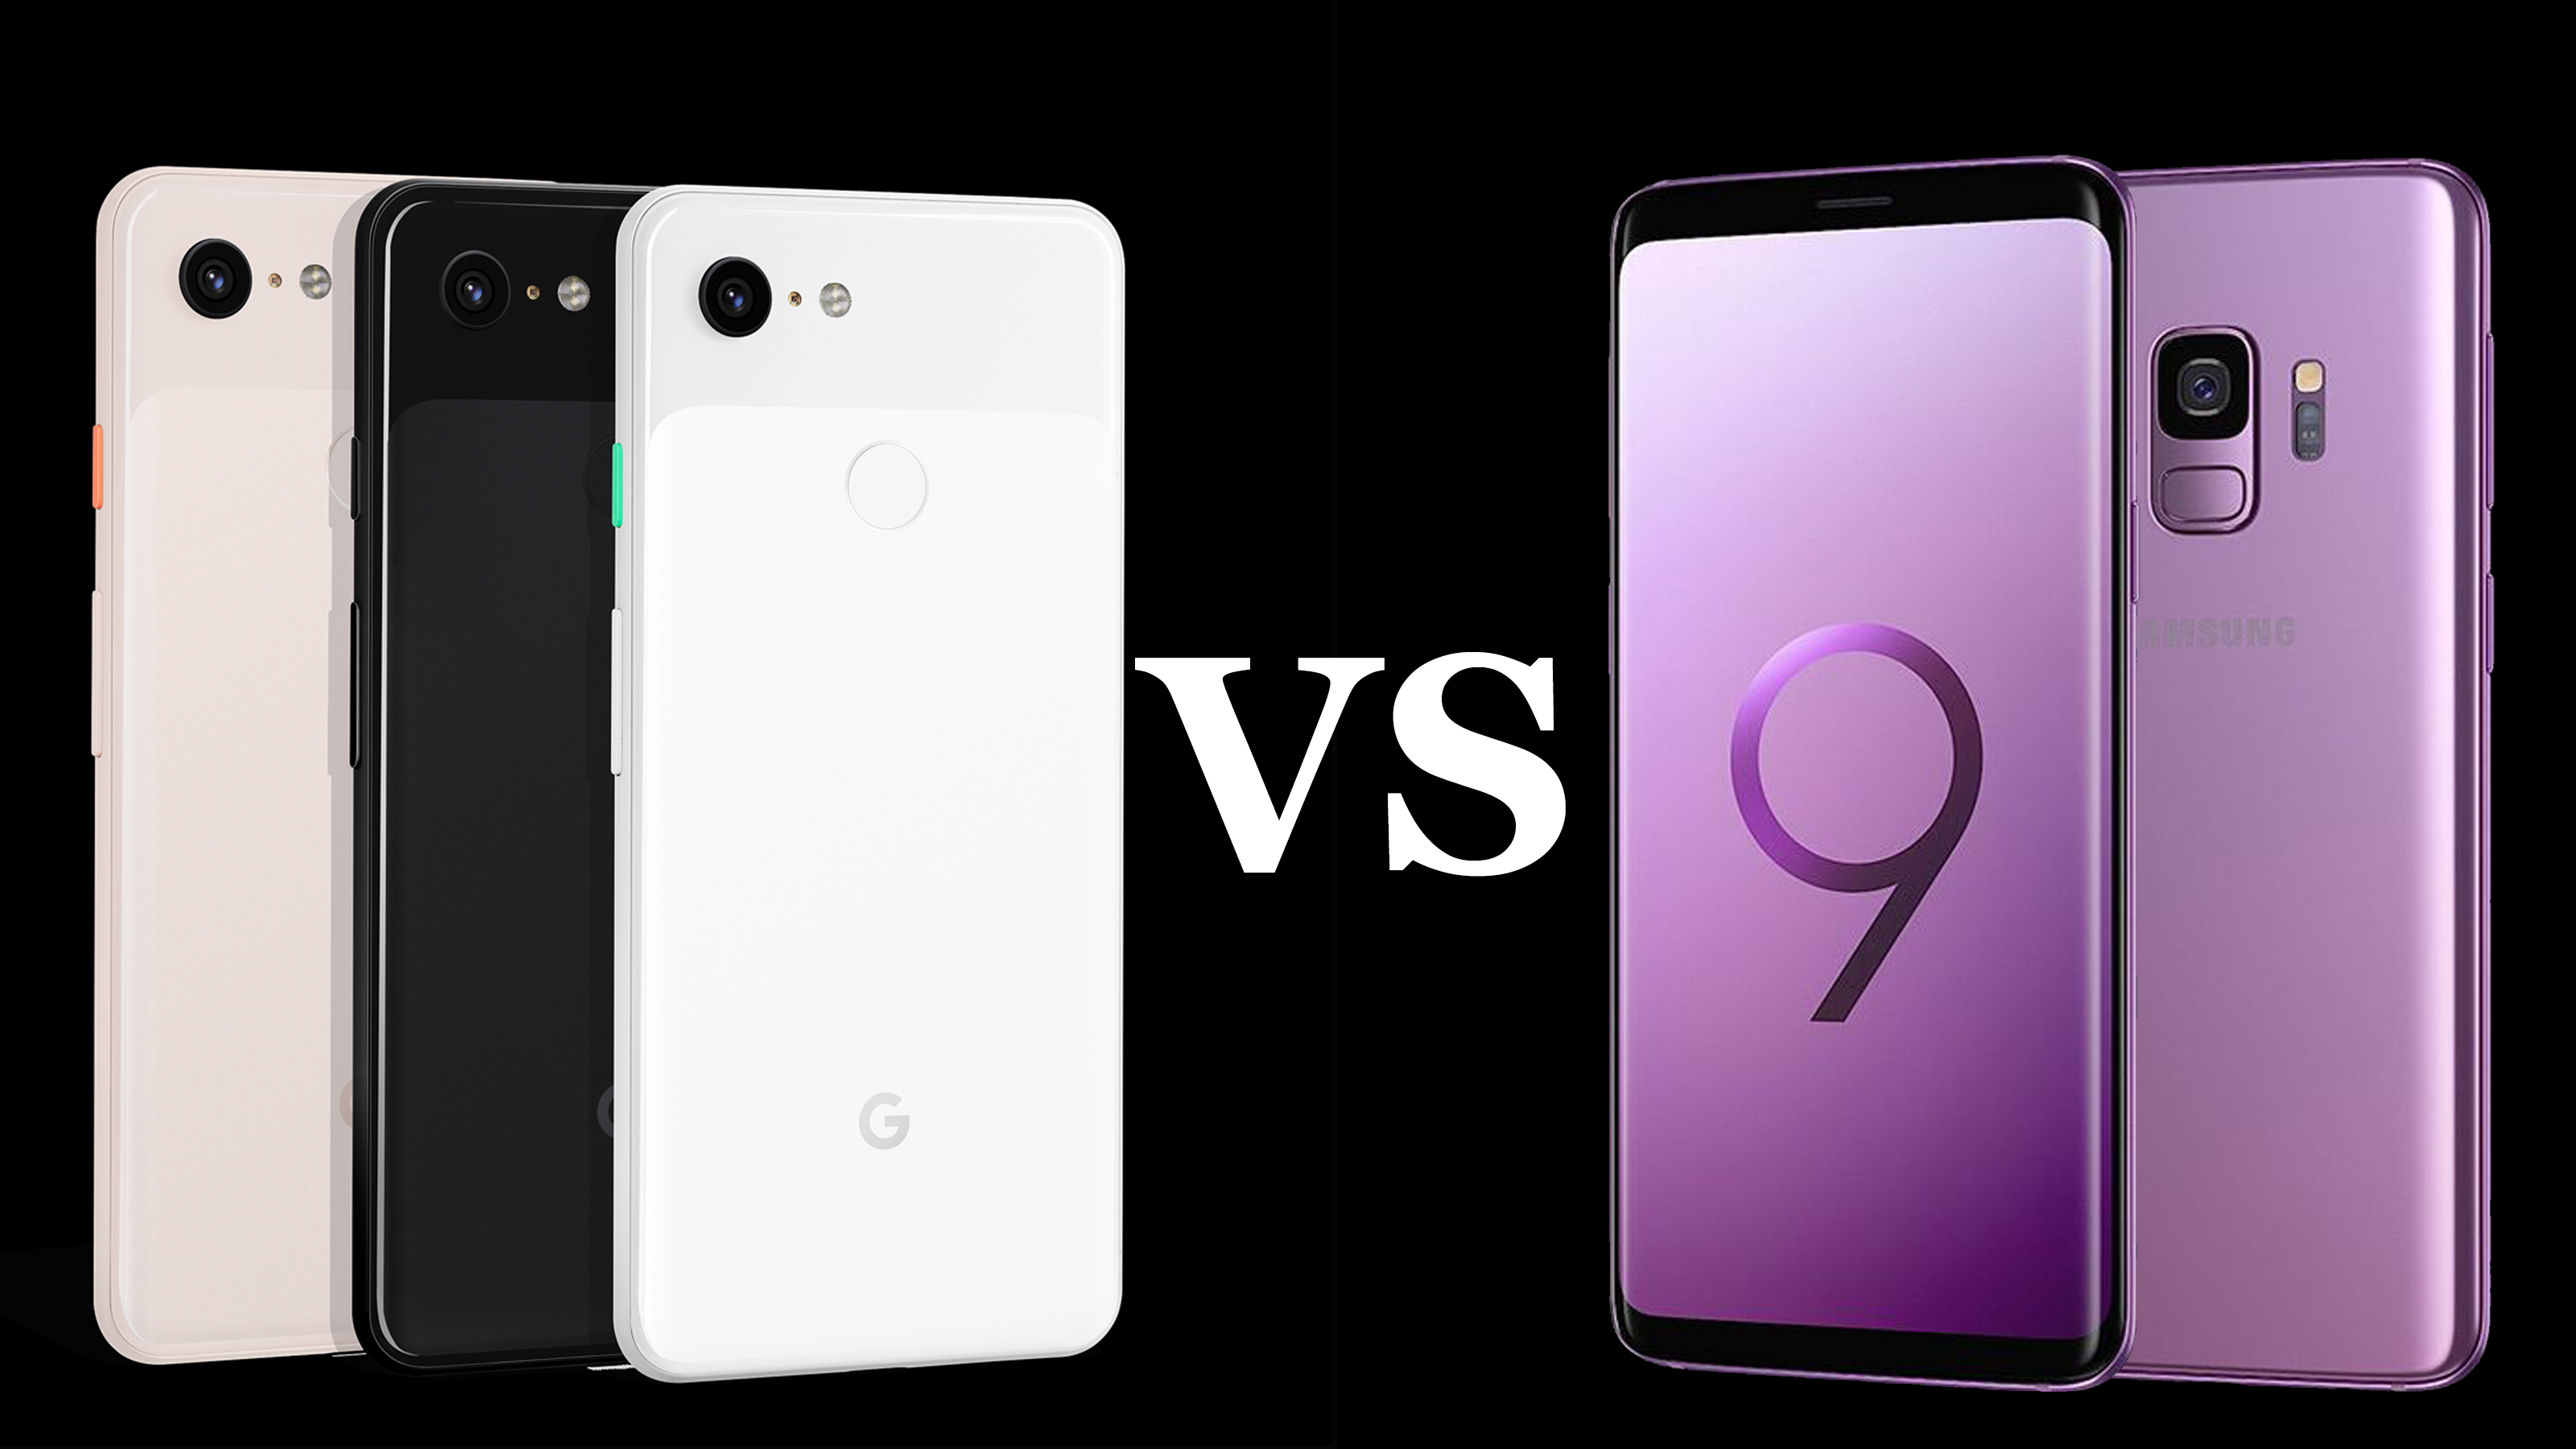 Google Pixel 3 vs Samsung Galaxy S9 | TechRadar